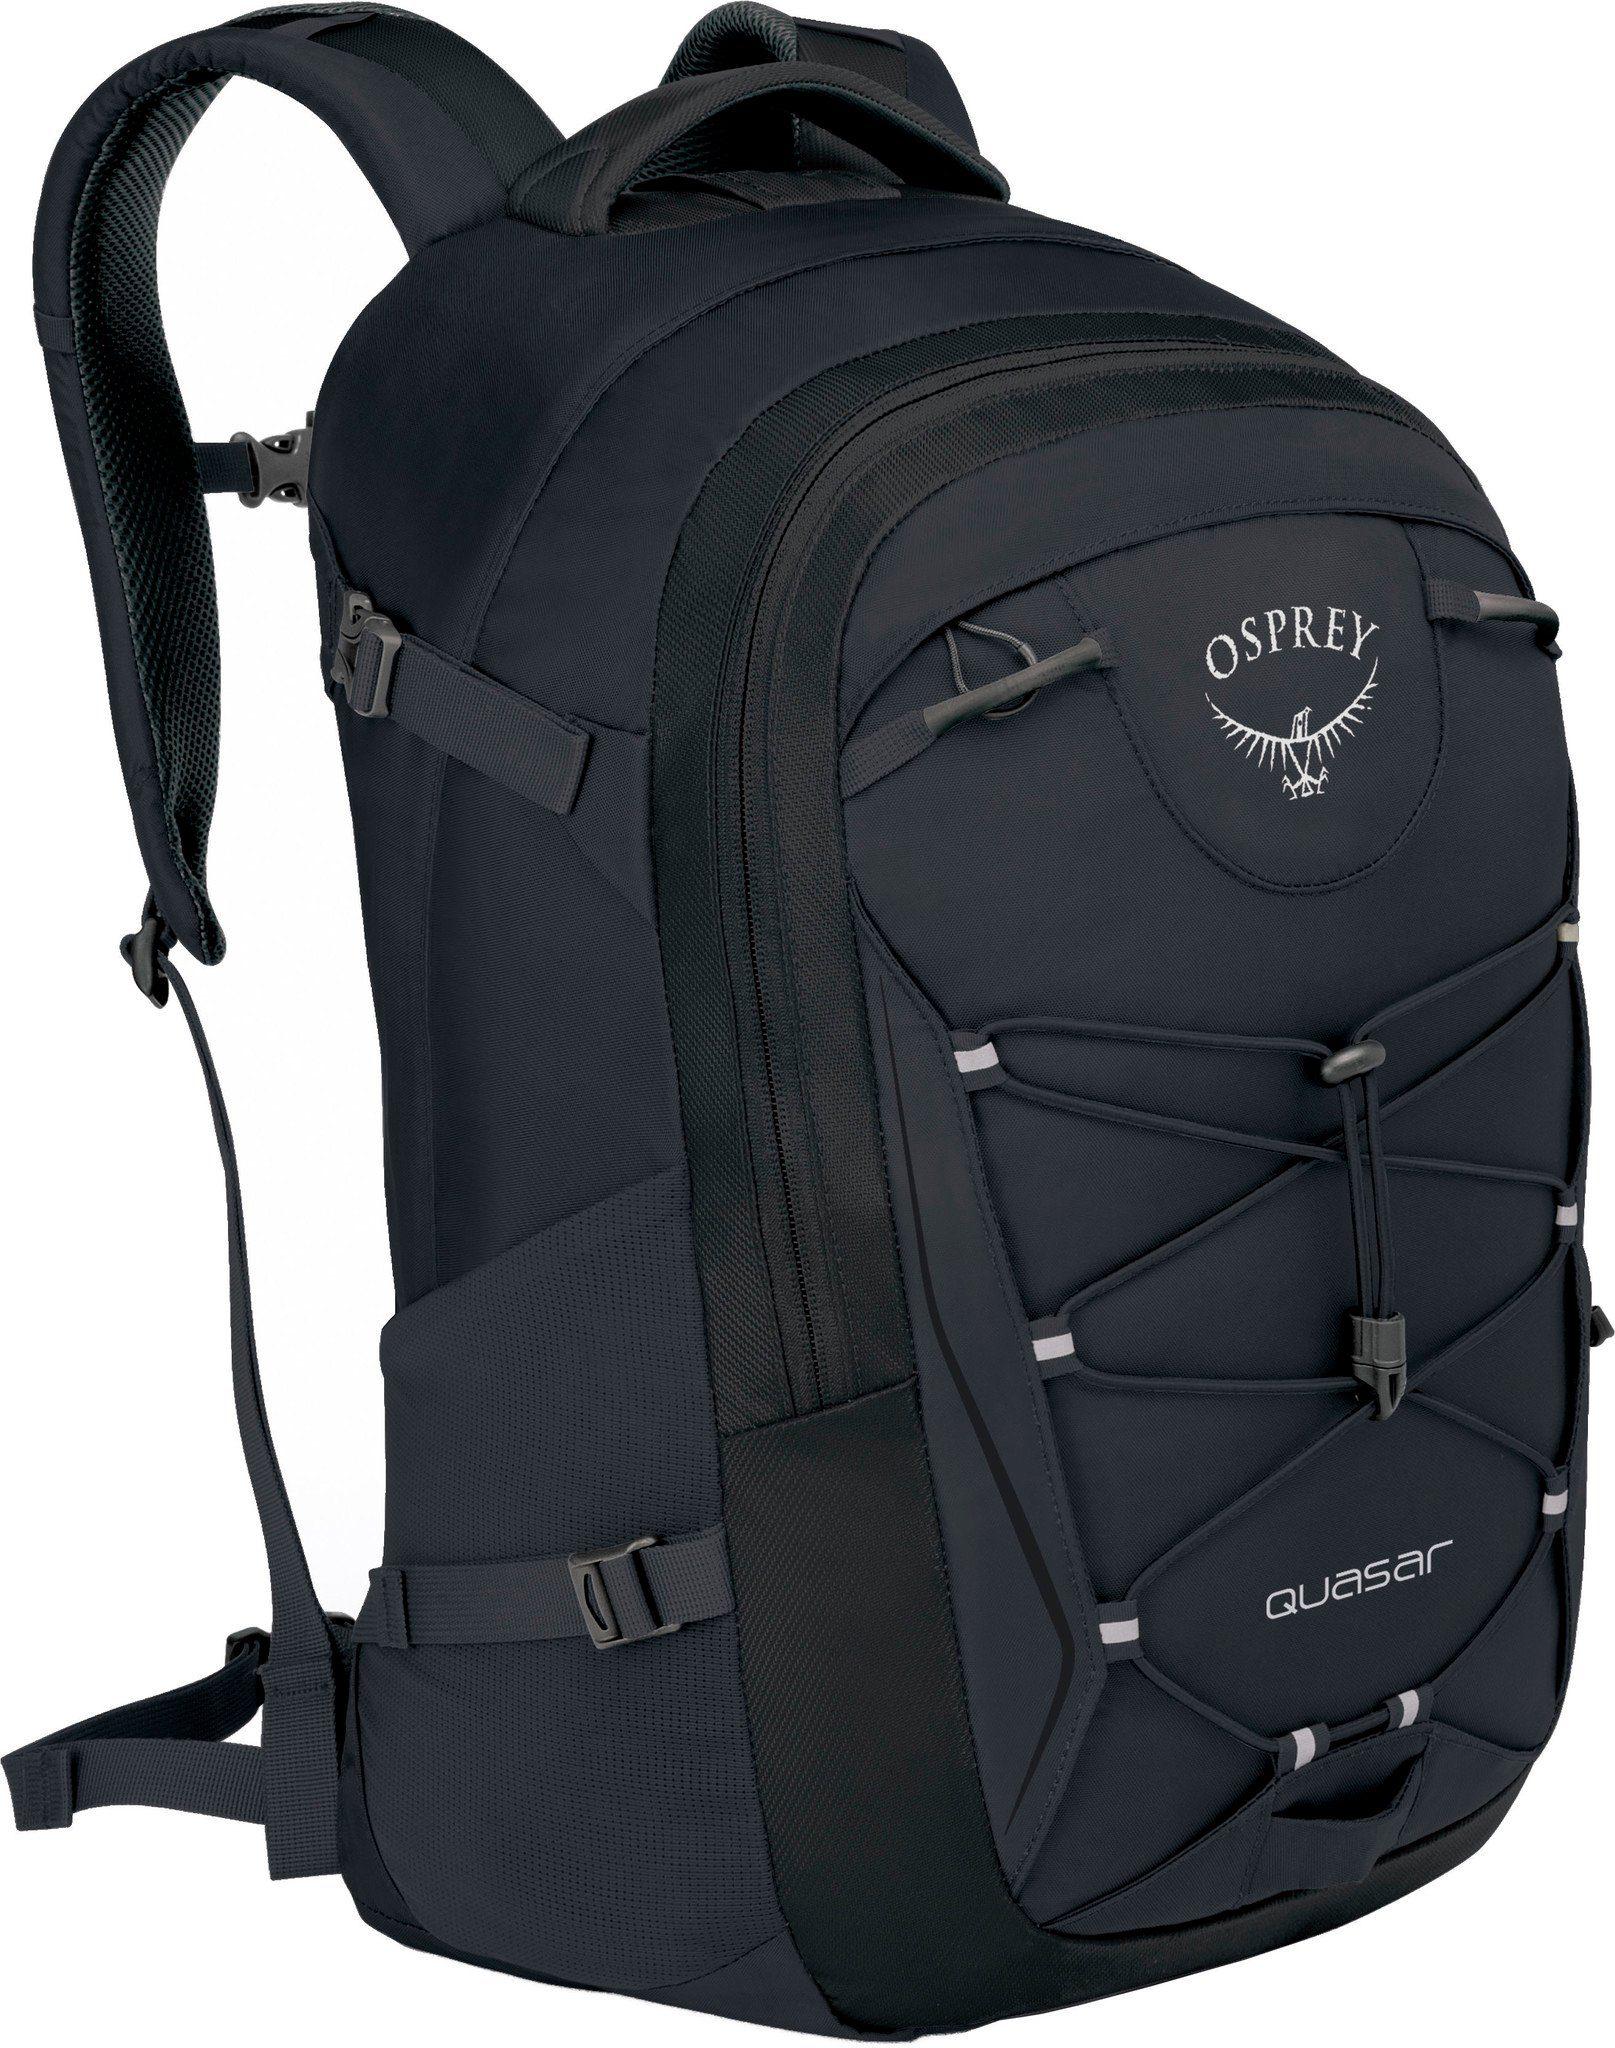 Osprey Wanderrucksack »Quasar 28 Backpack Men«